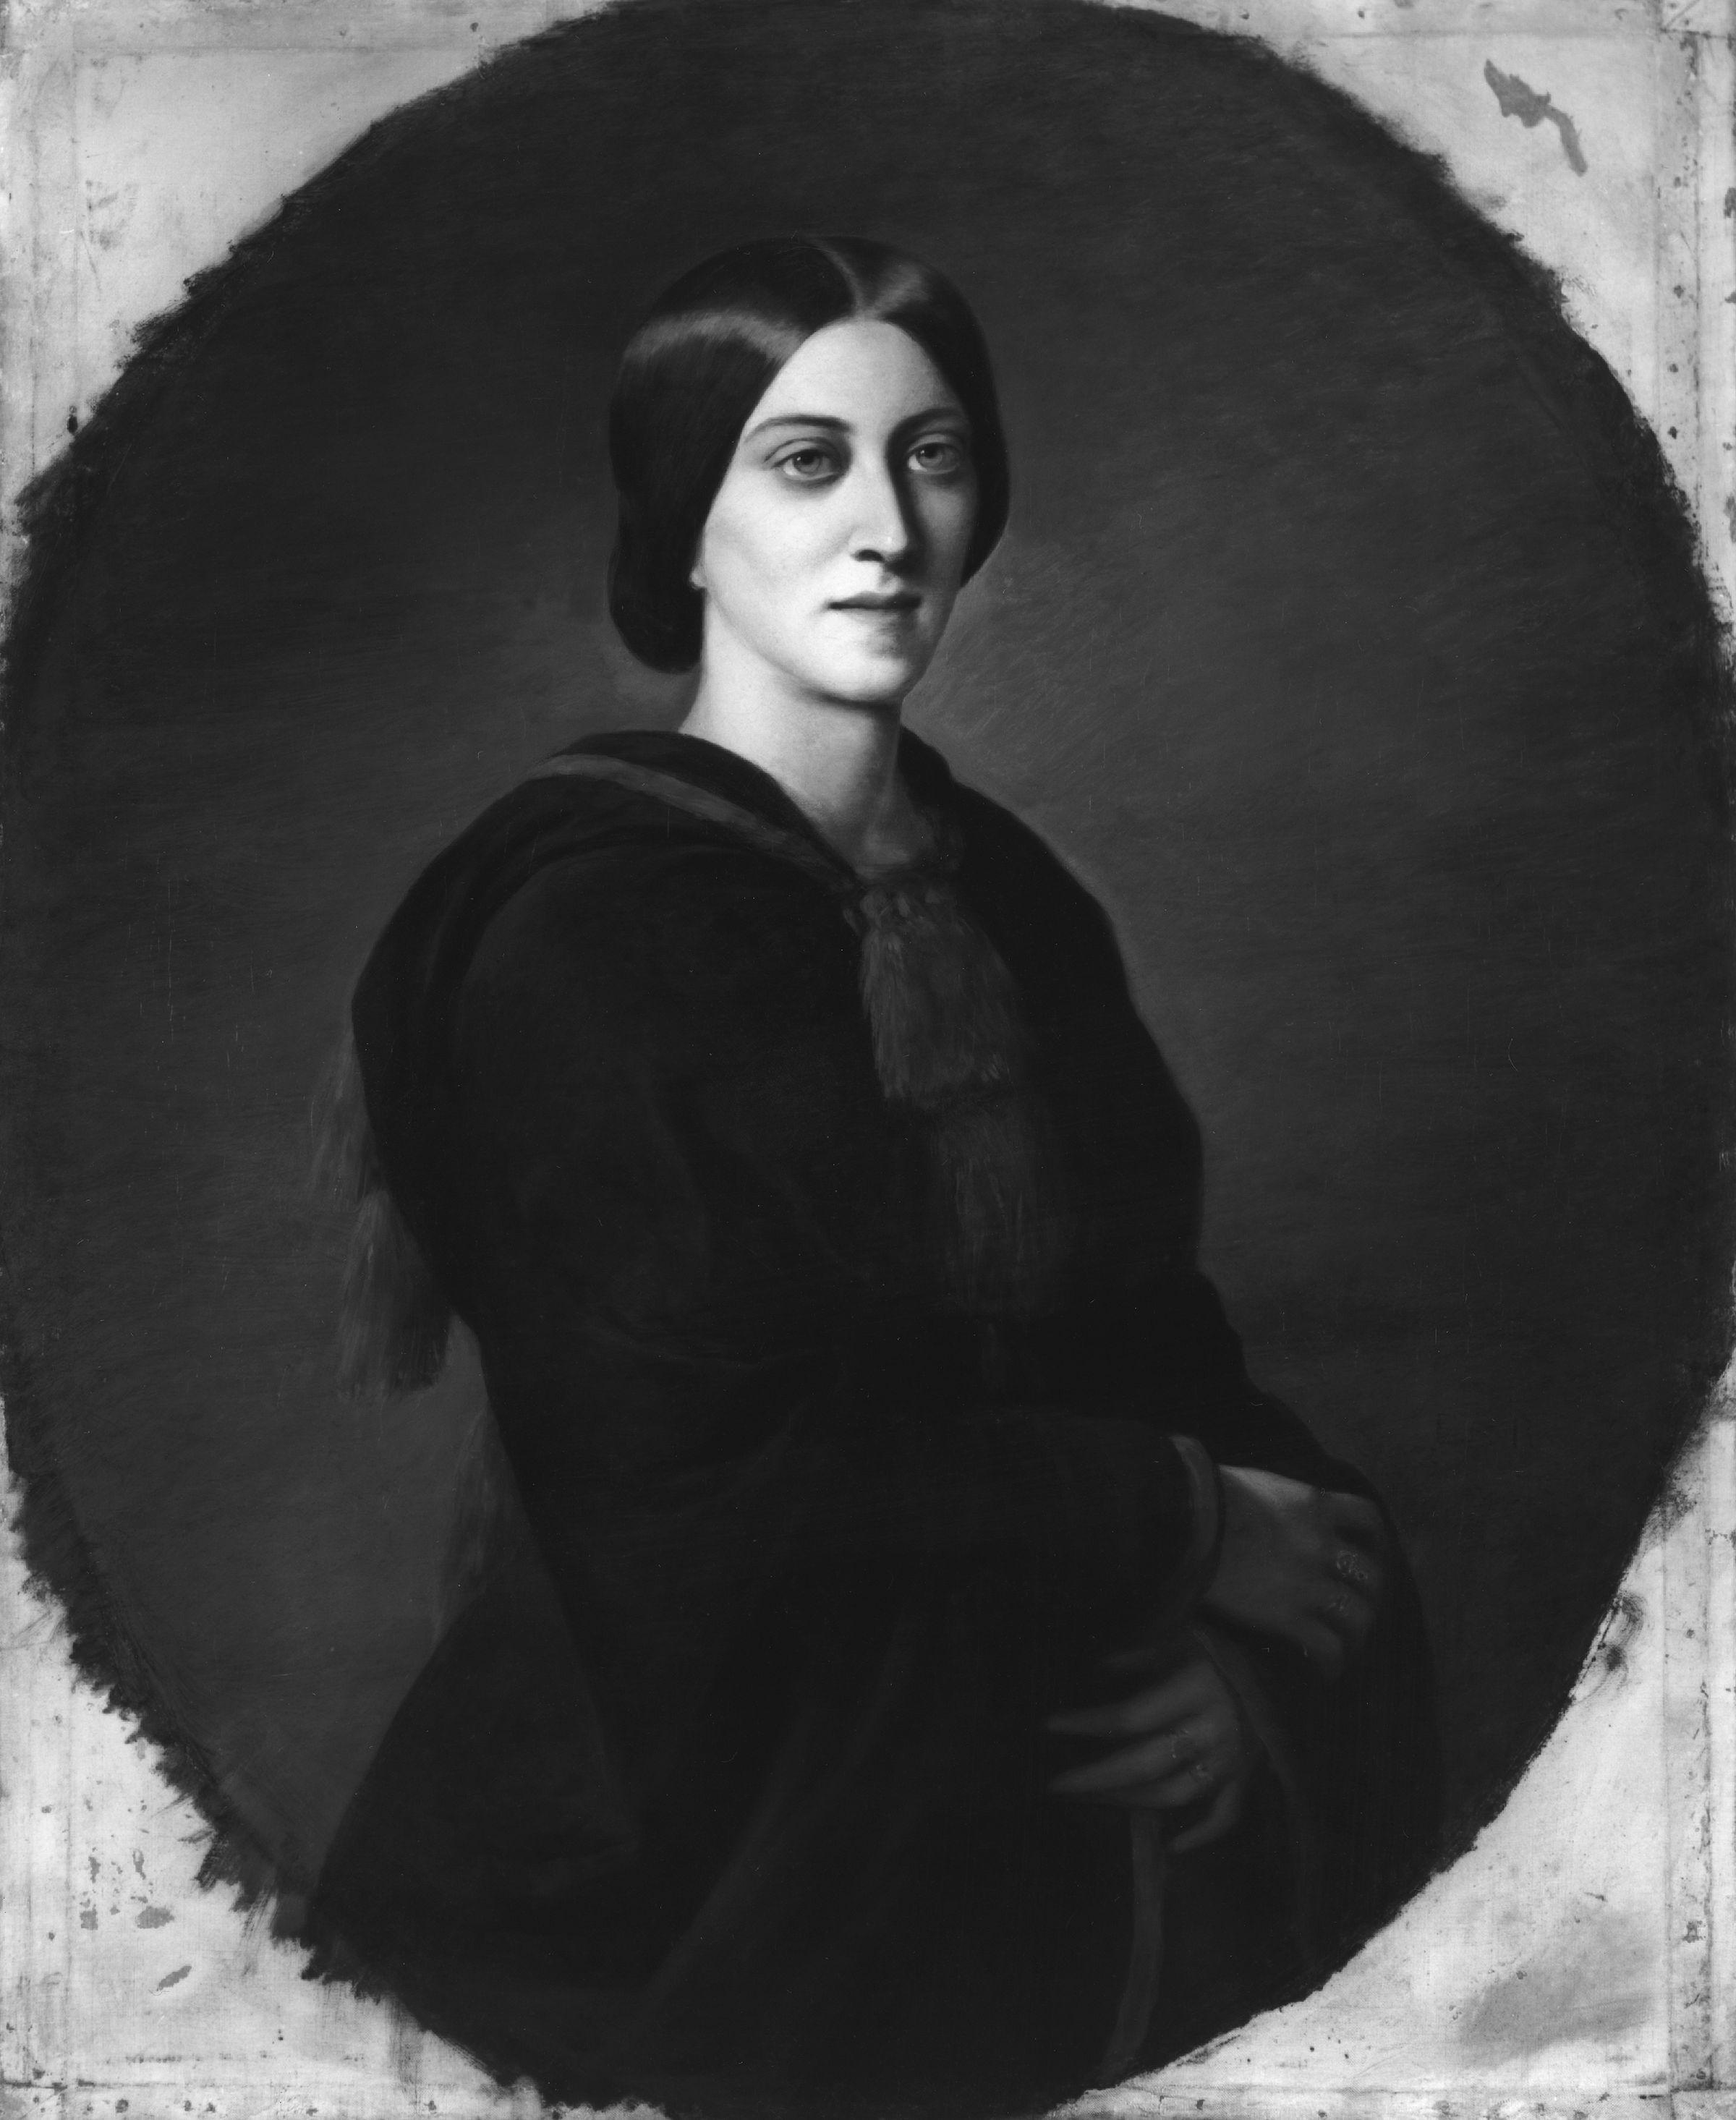 Adelaide Procter